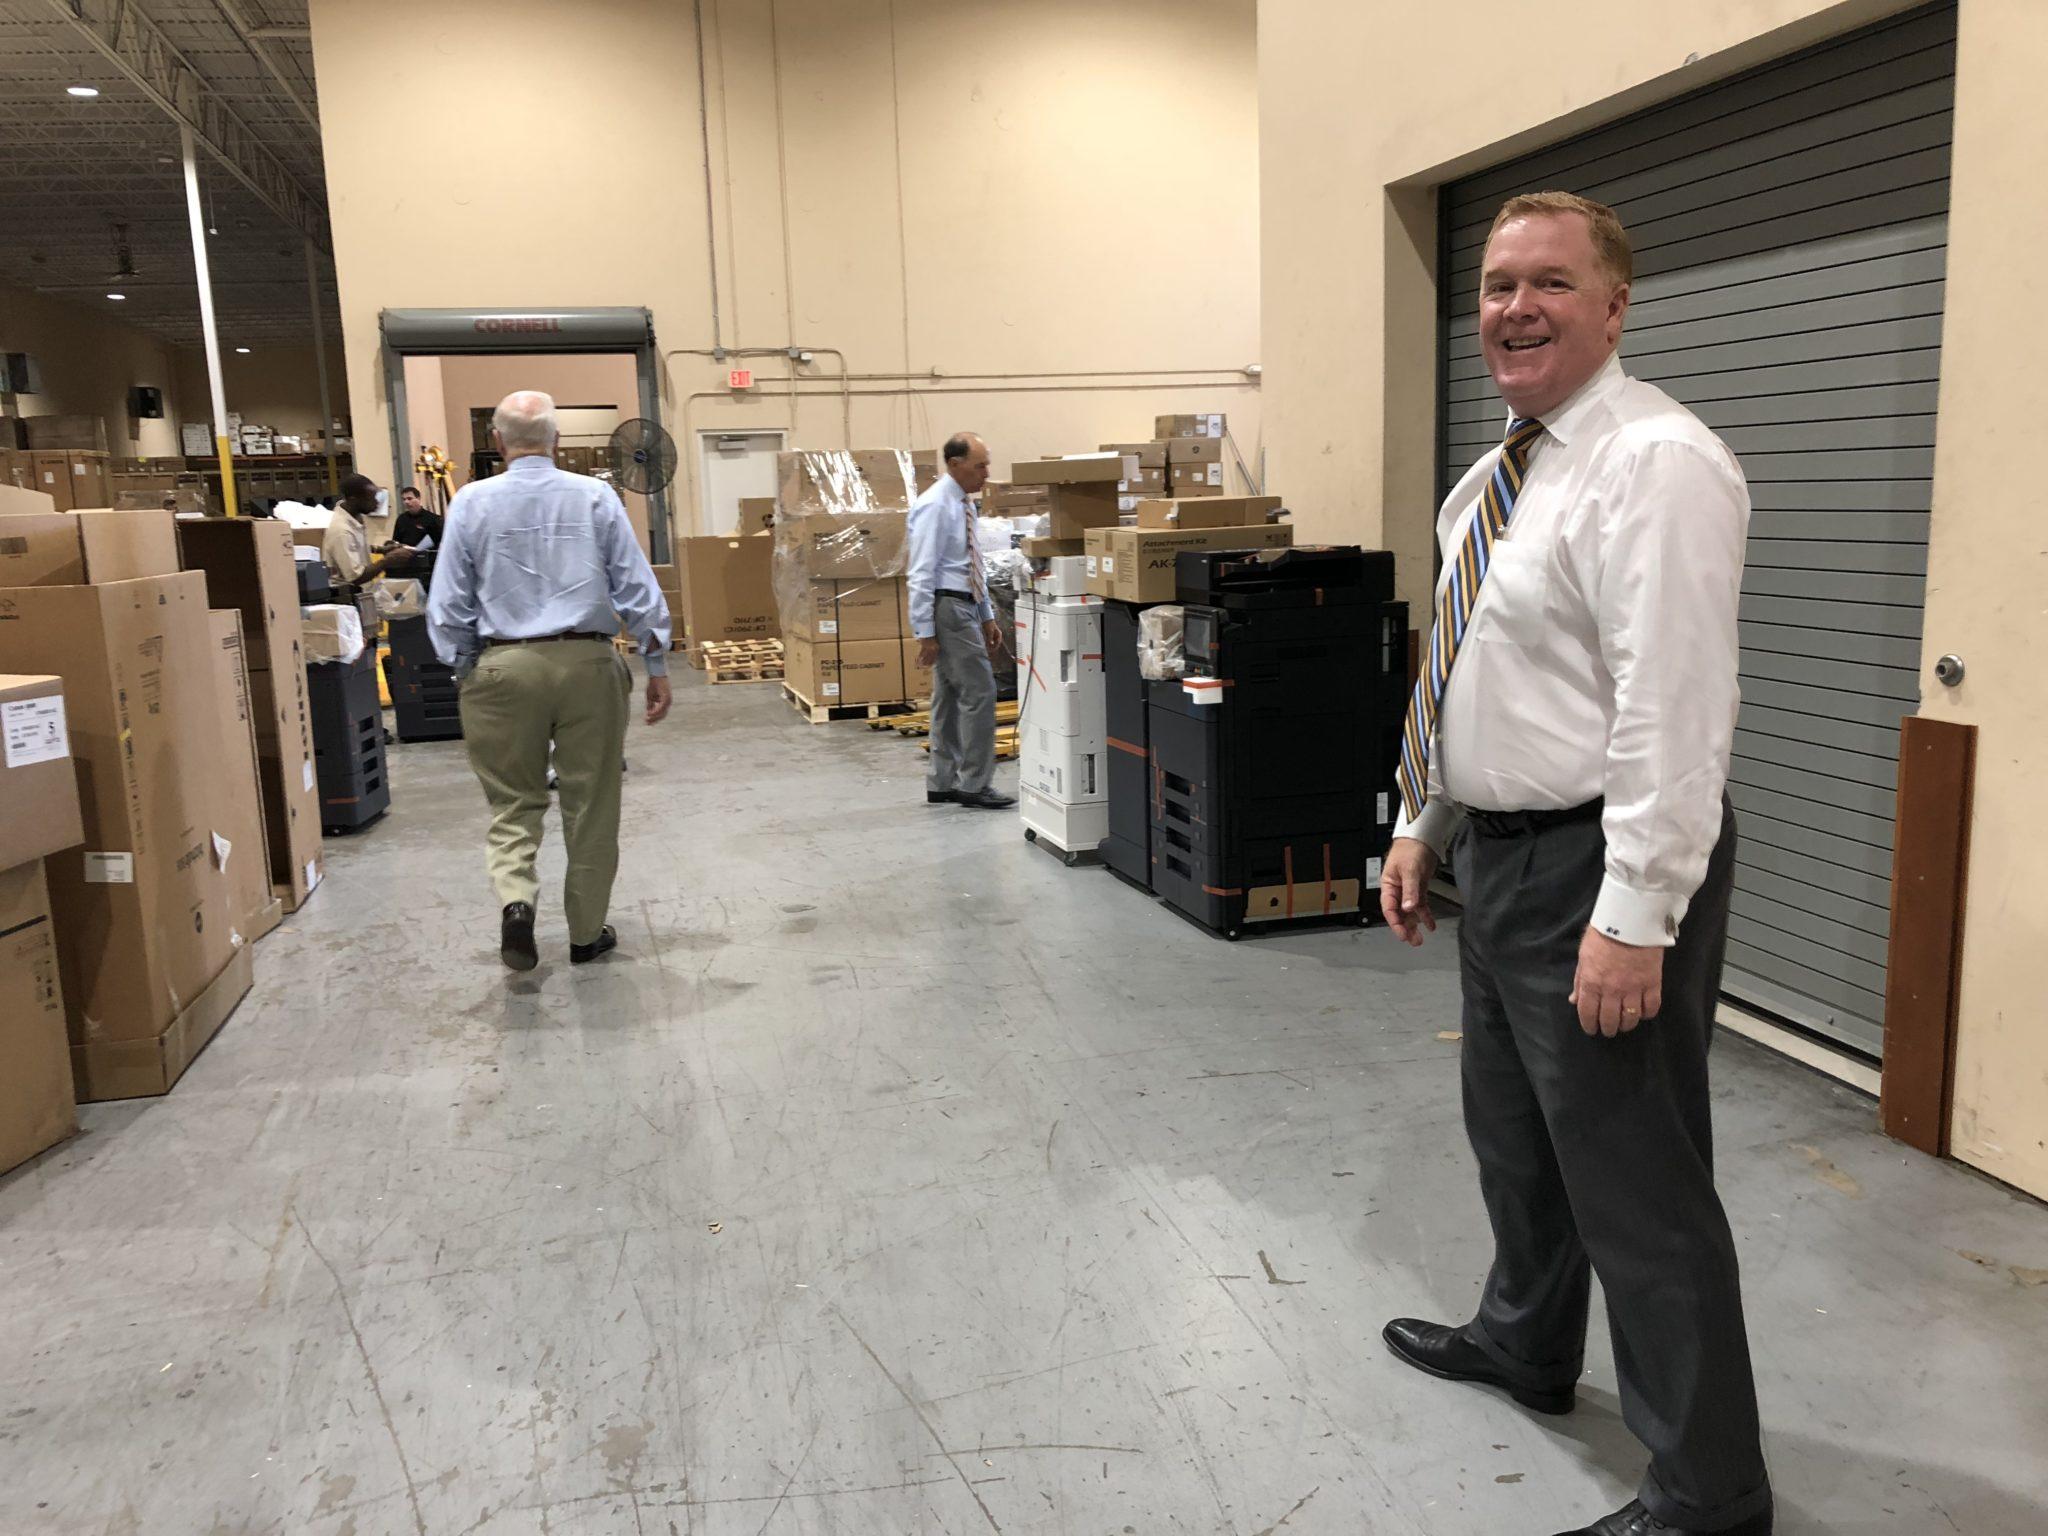 Dan Doyle Jr. walking through warehouse